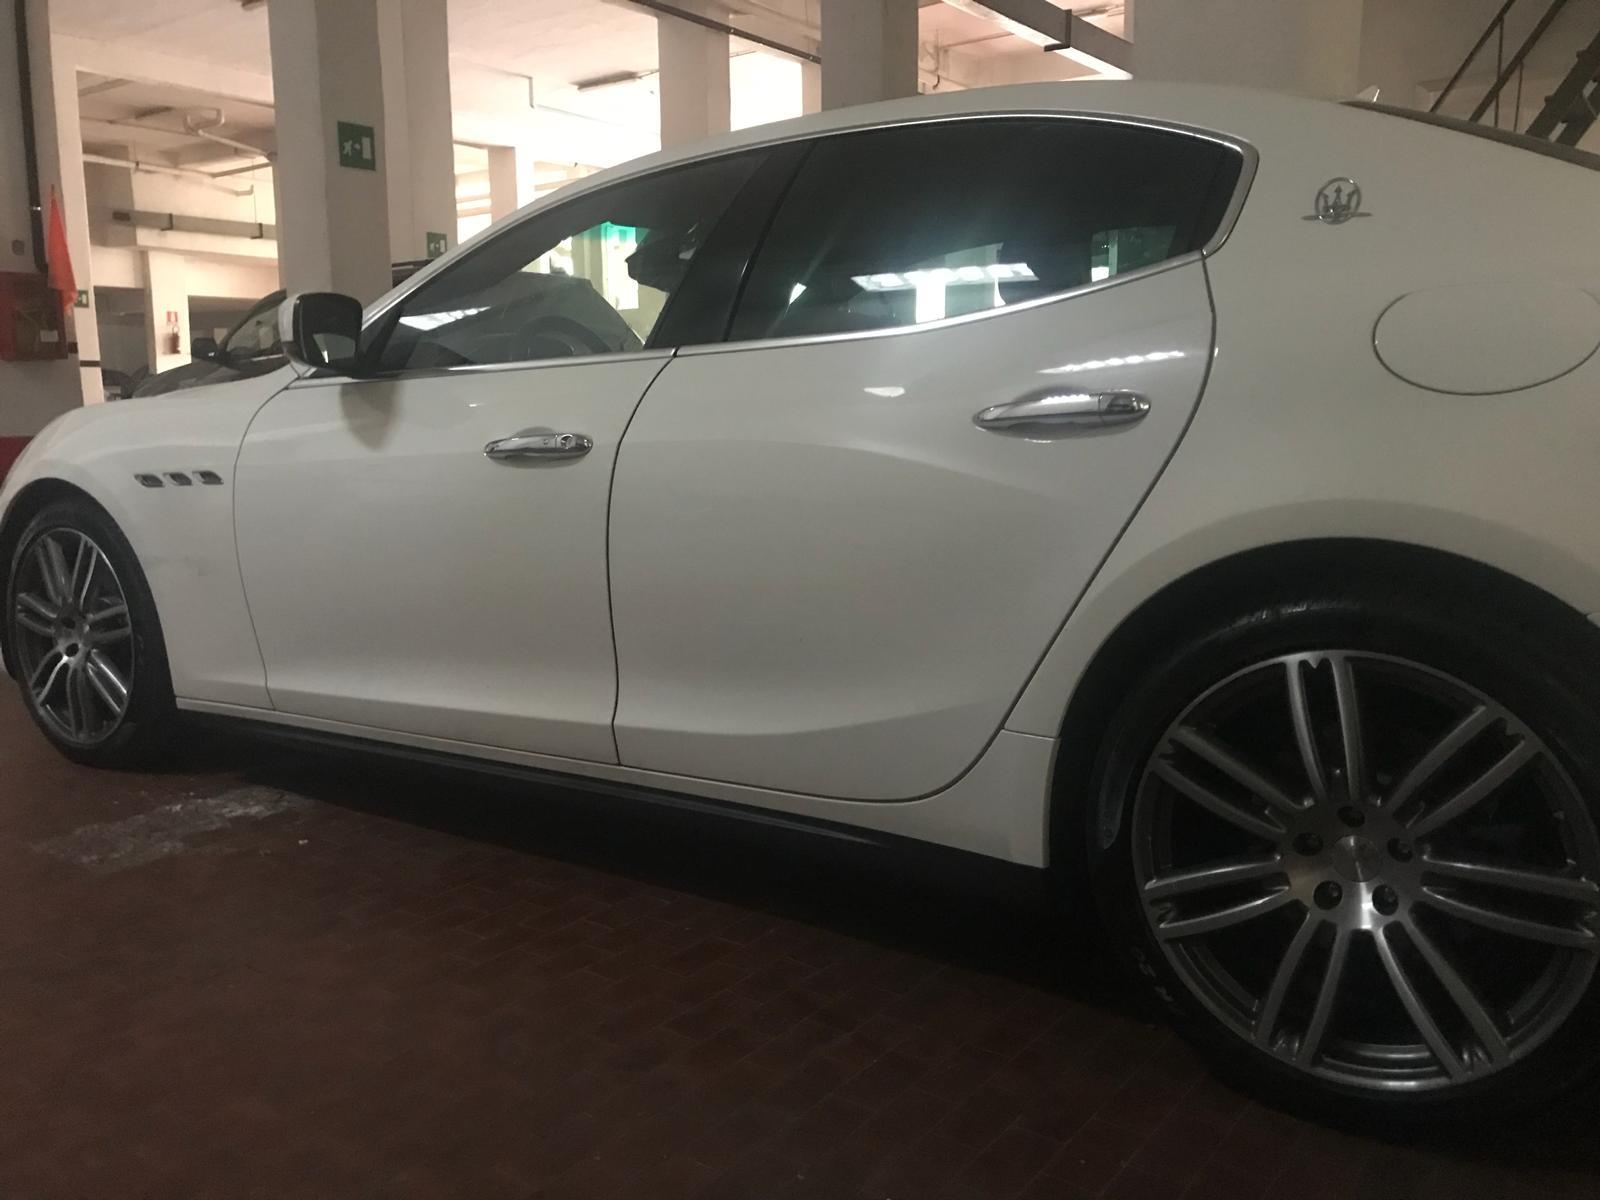 Maserati Ghibli noleggio auto matrimoni roma - noleggio auto nozze roma - auto matrimonio - noleggio auto roma